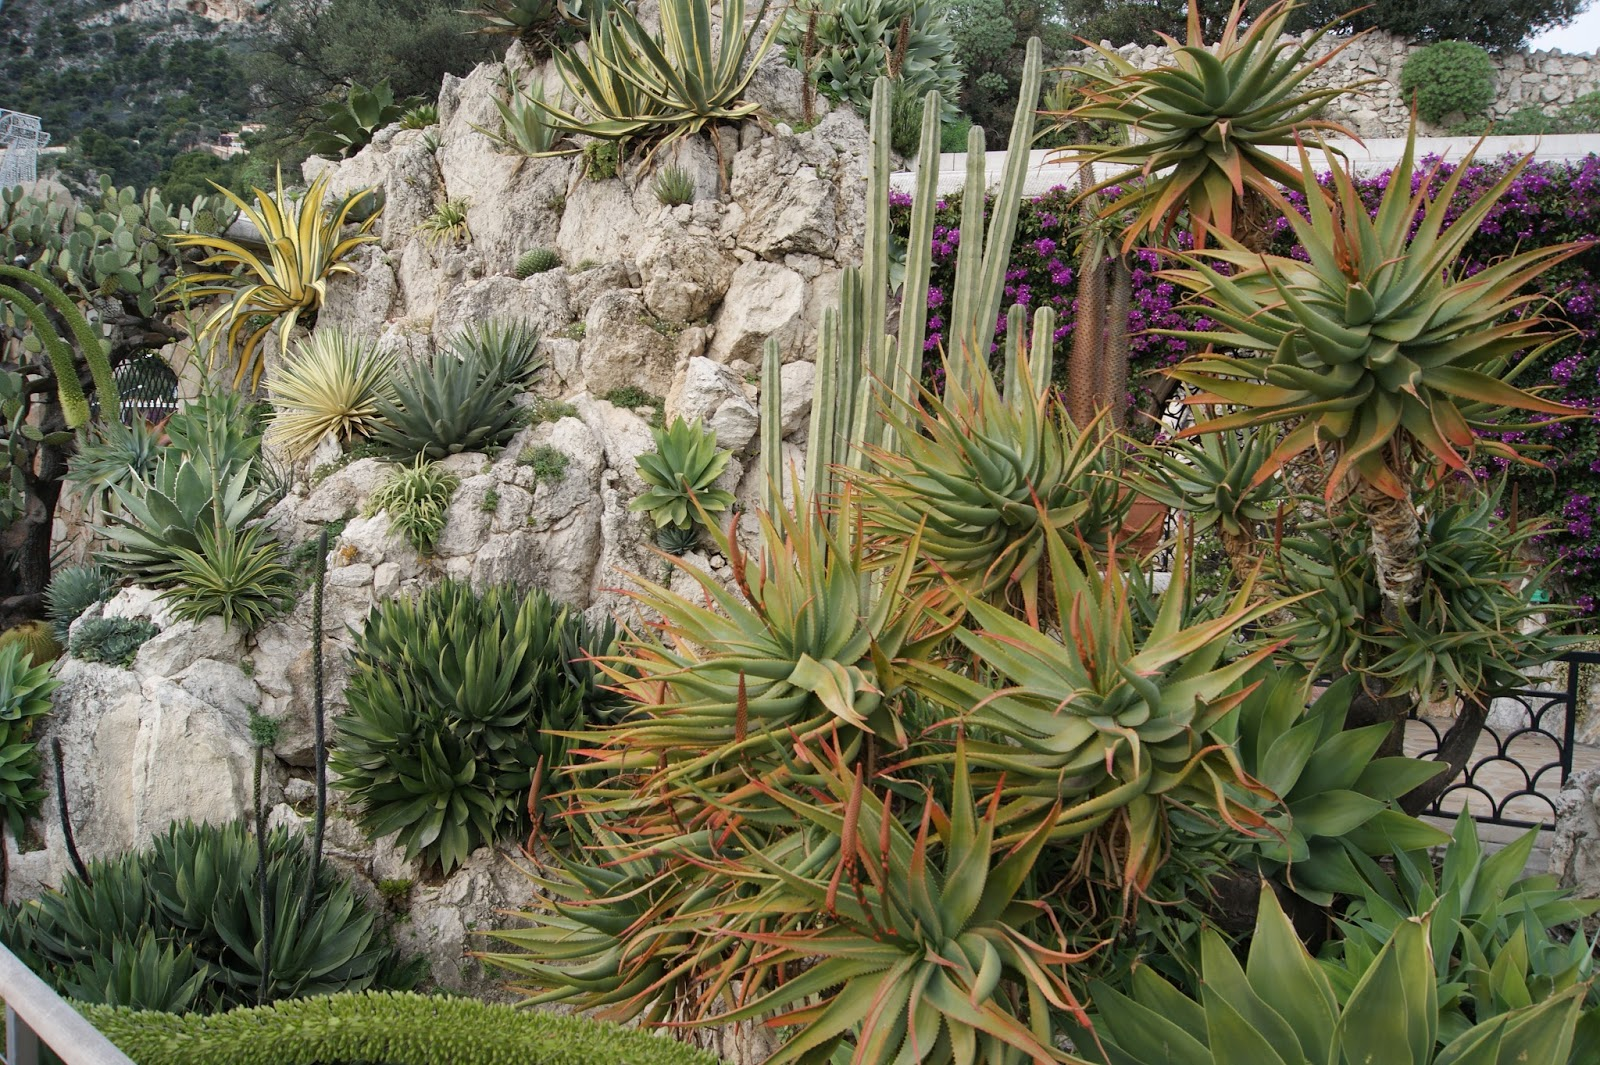 Succulent sundae monaco jardin exotique part 1 for Jardin exotique